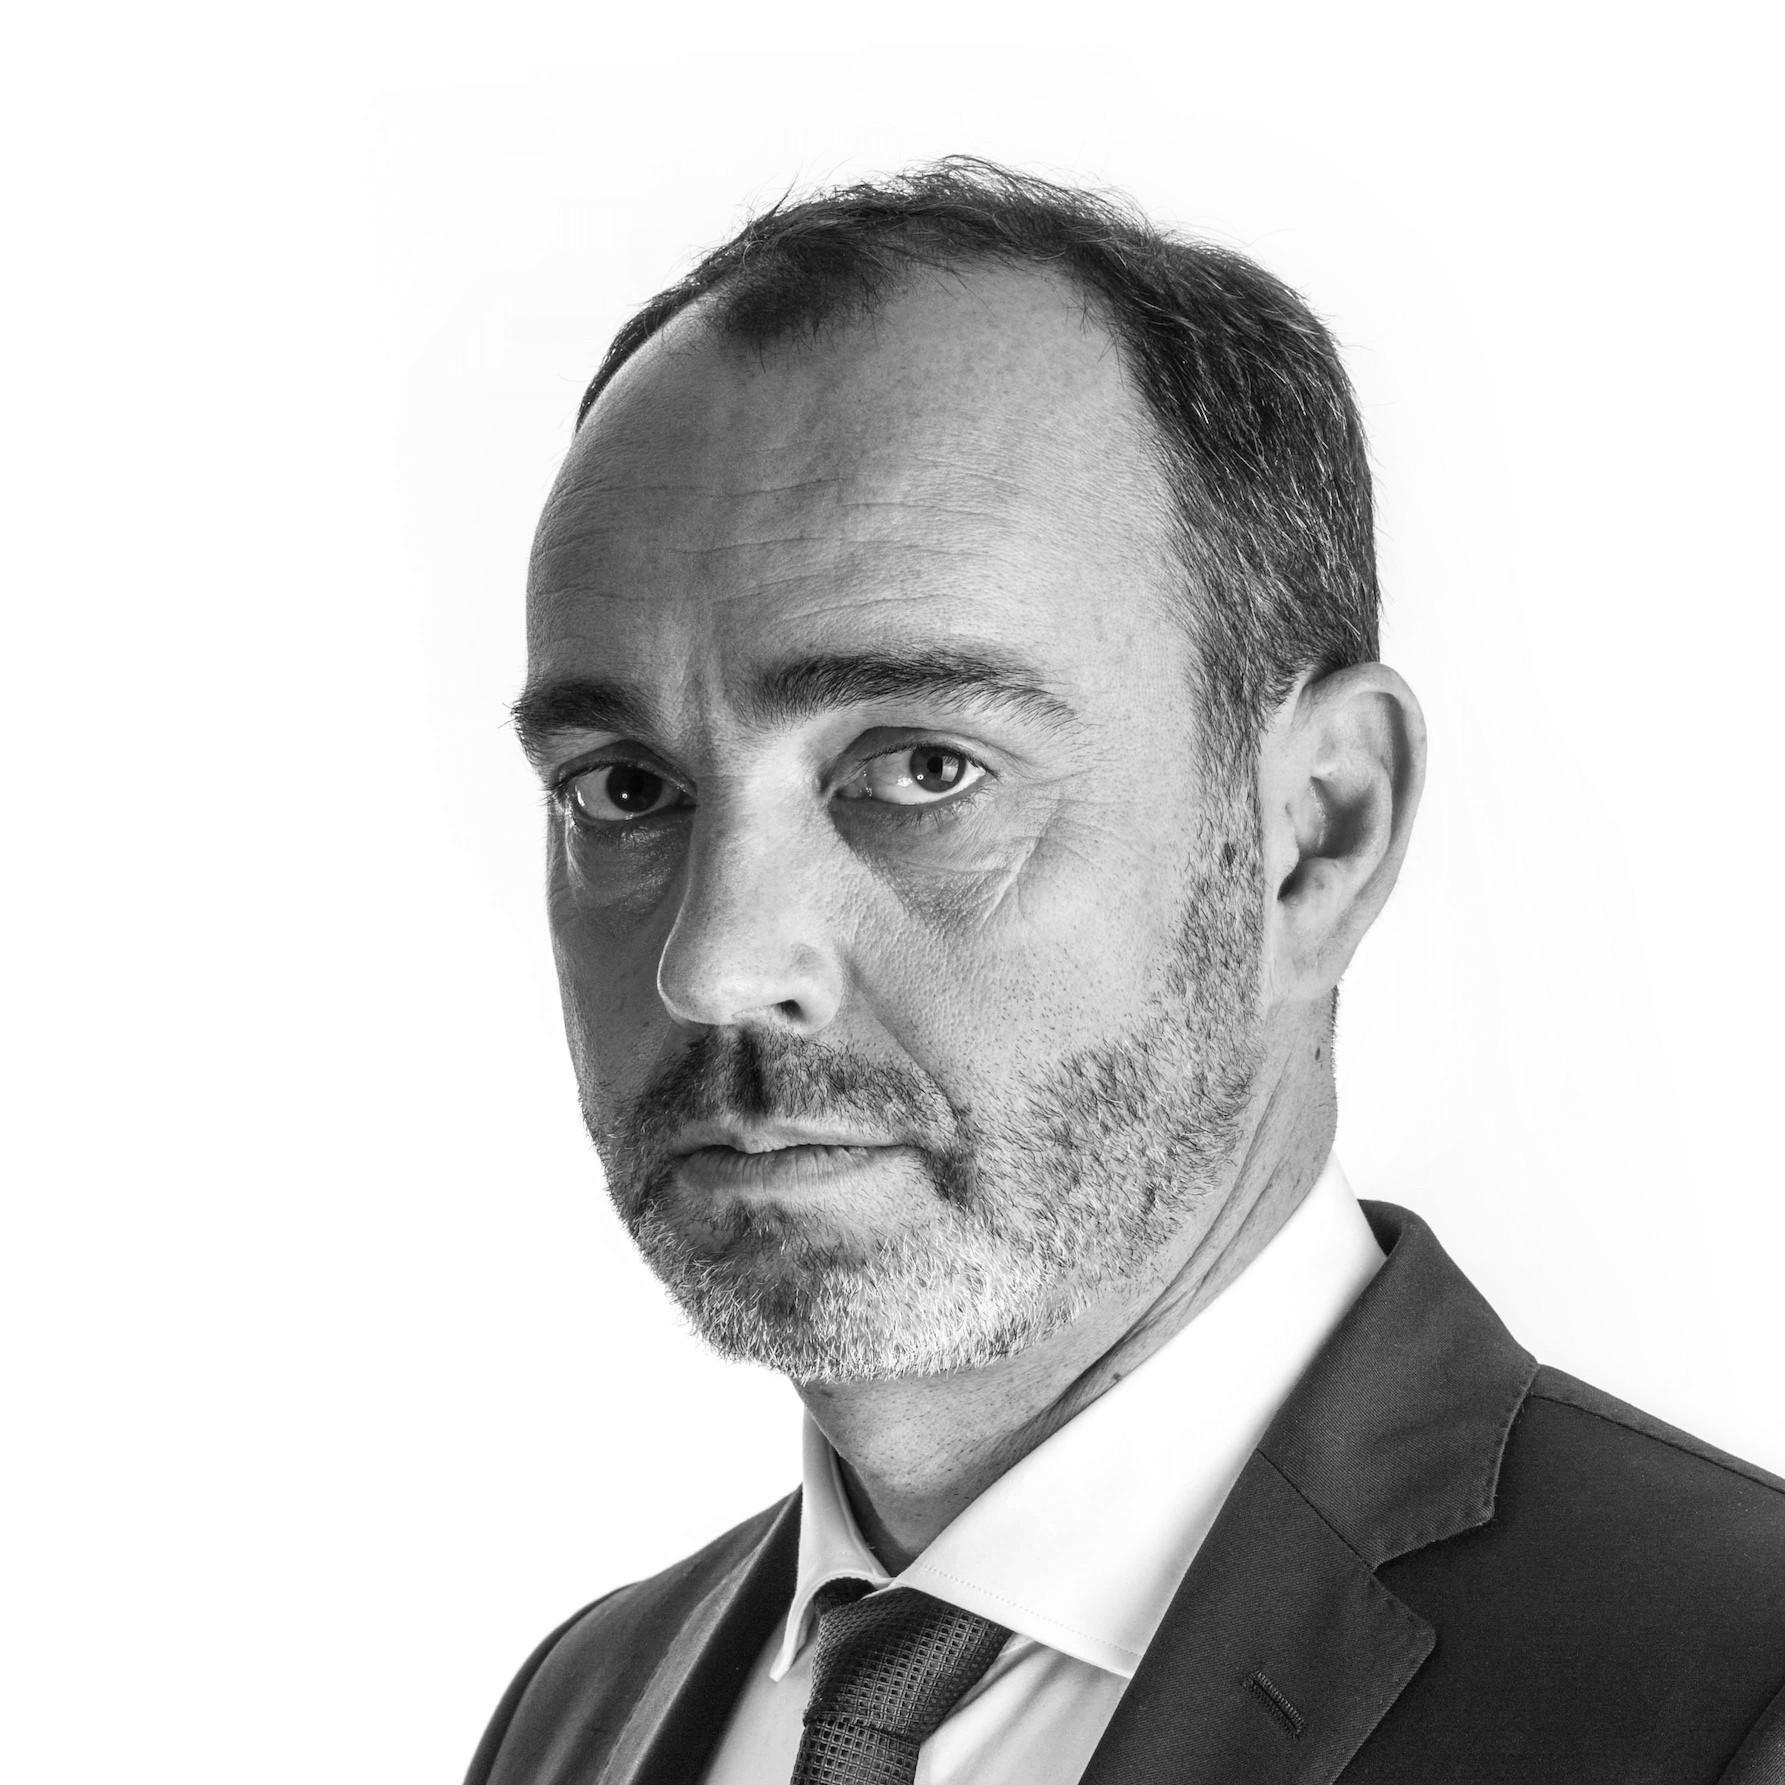 Nicolas Mignot